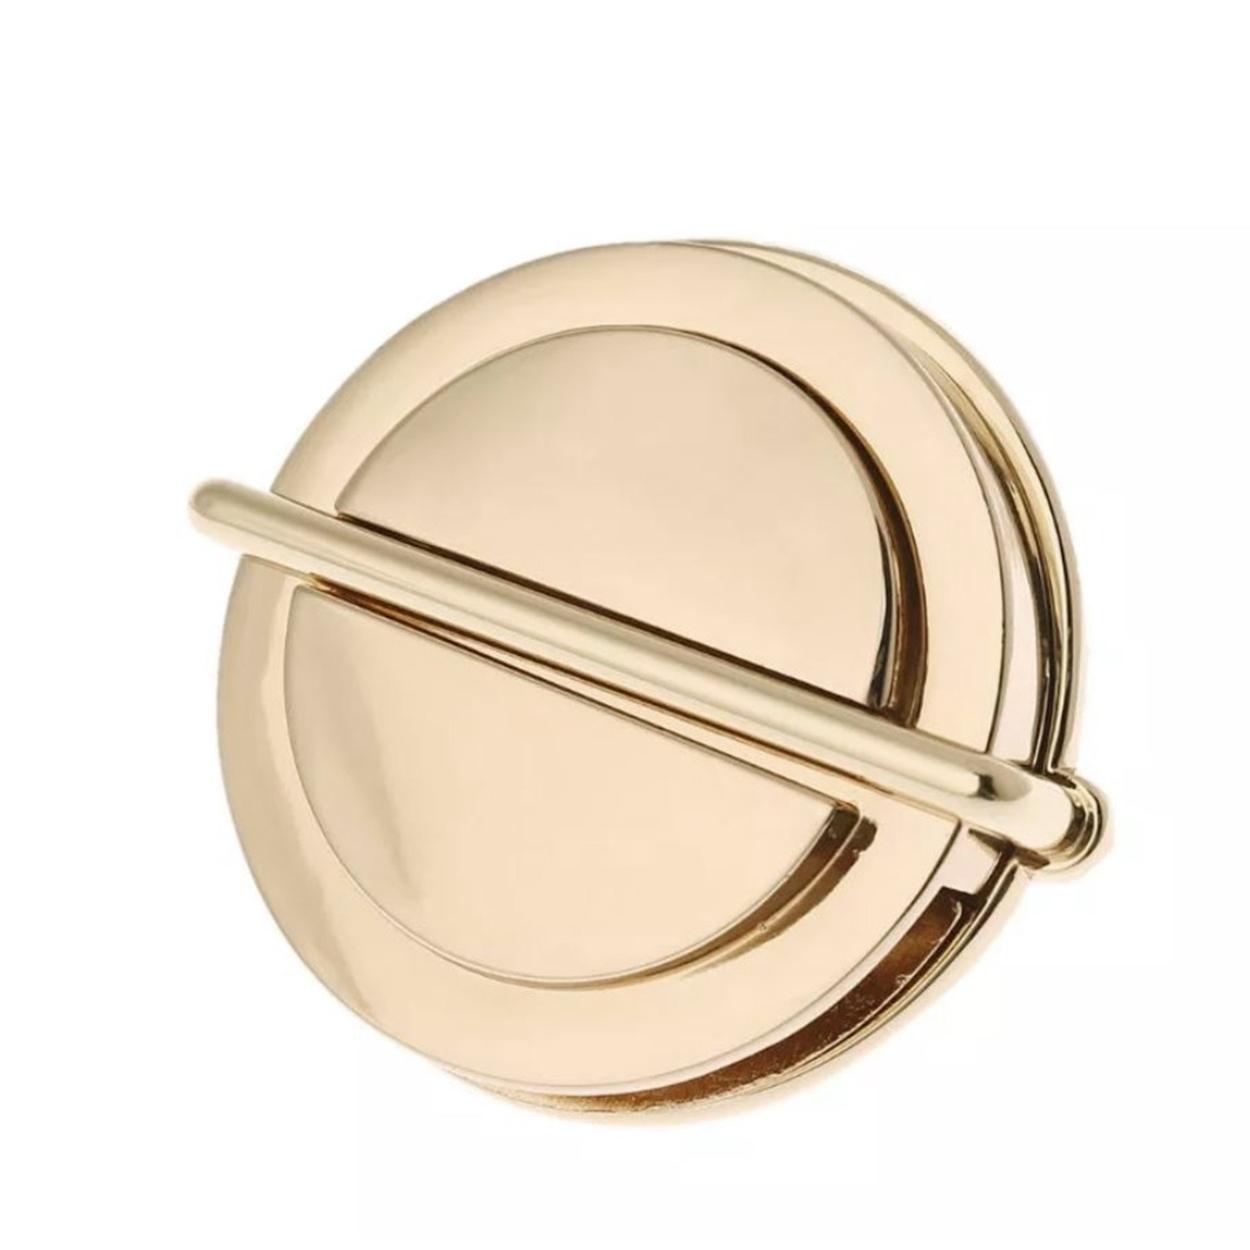 Замок-клапан на зажимах круг 30 мм золото